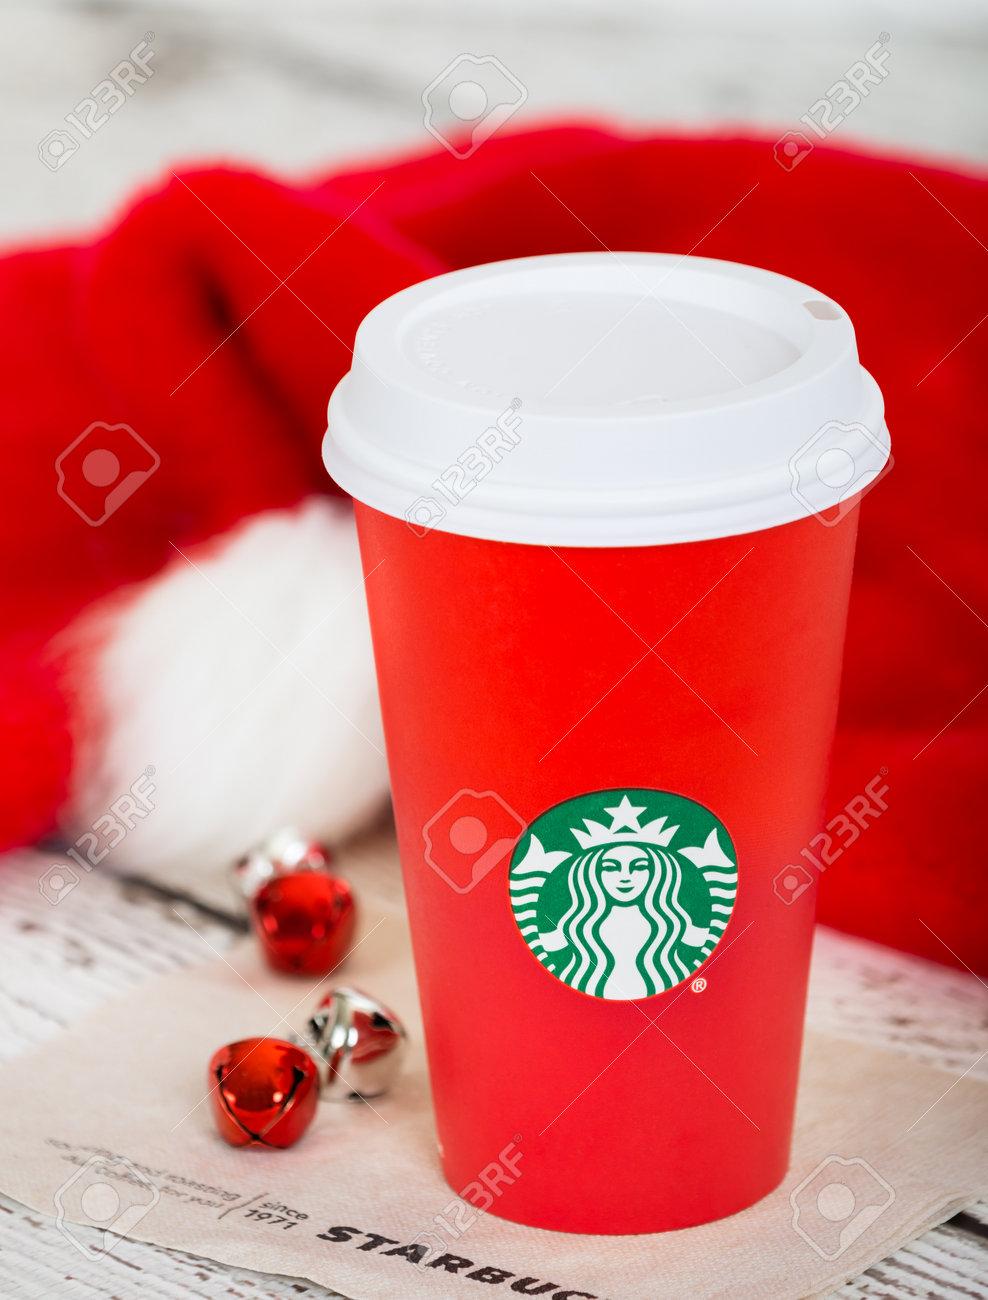 DALLAS, TX - NOVEMBER 10, 2015: A cup of Starbucks popular holiday